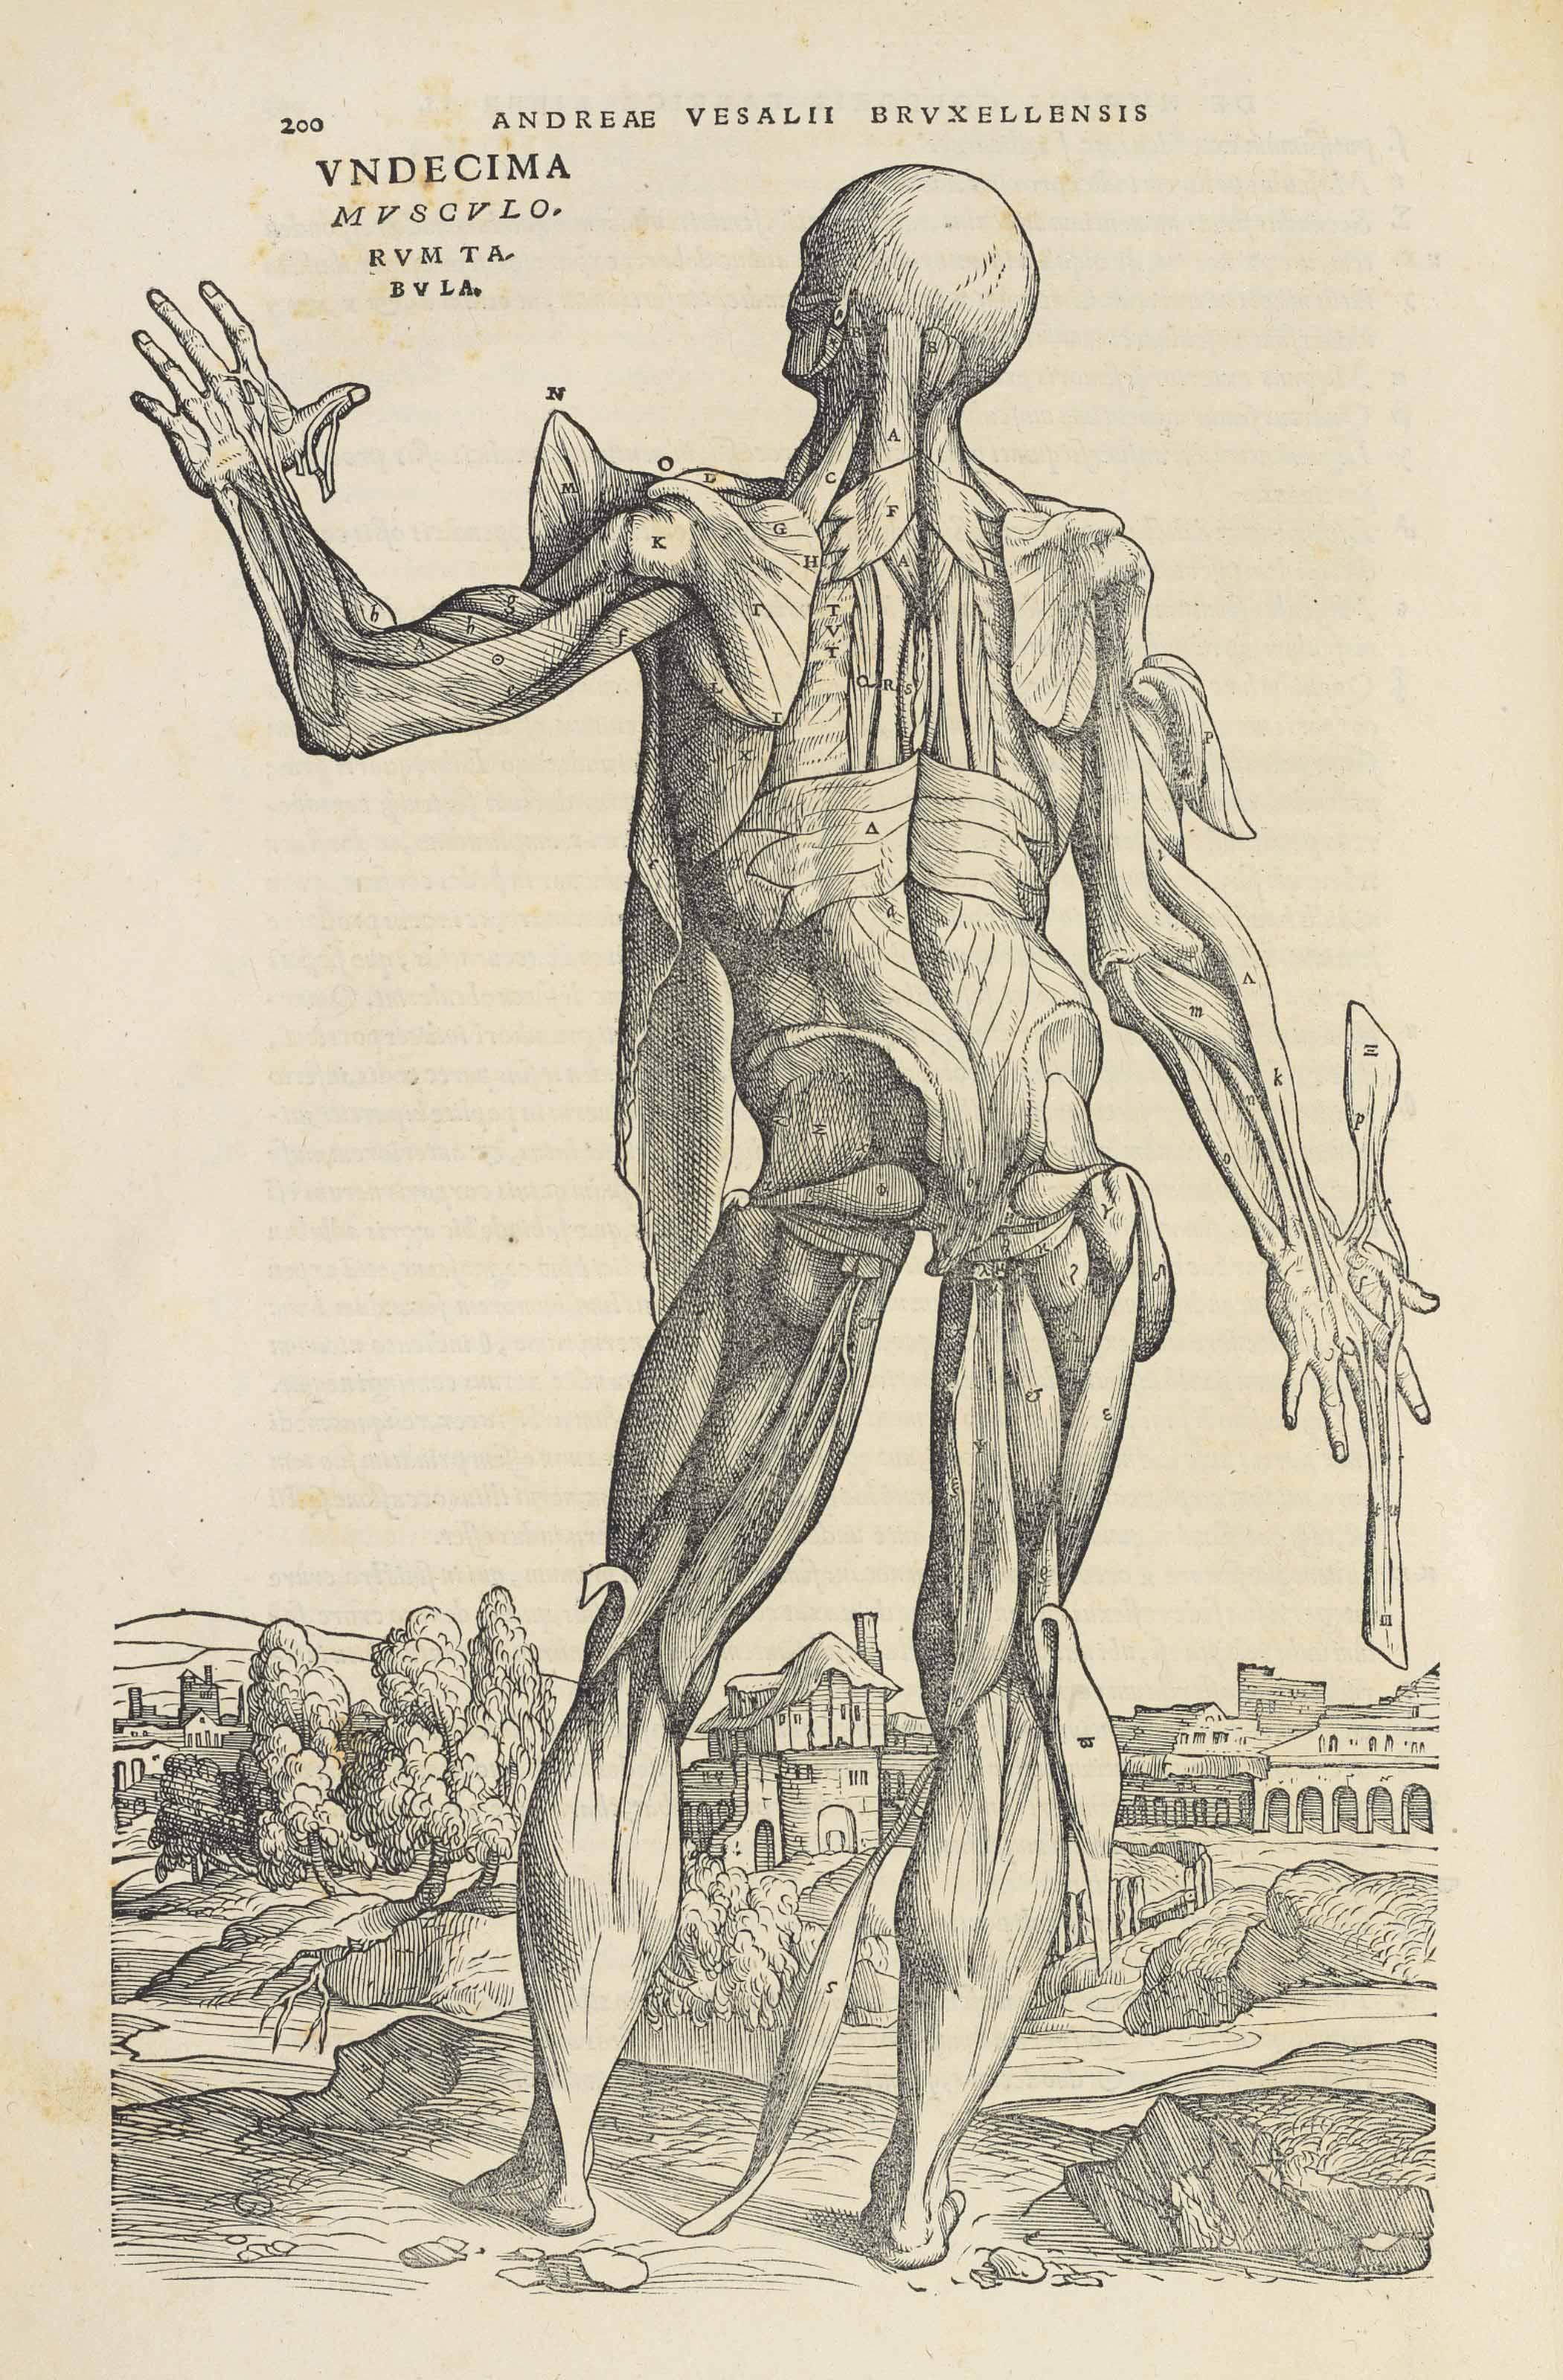 VESALIUS, Andreas (1514-1564). De humani corporis fabrica libri septem. Basel: Johannes Oporinus, June 1543.